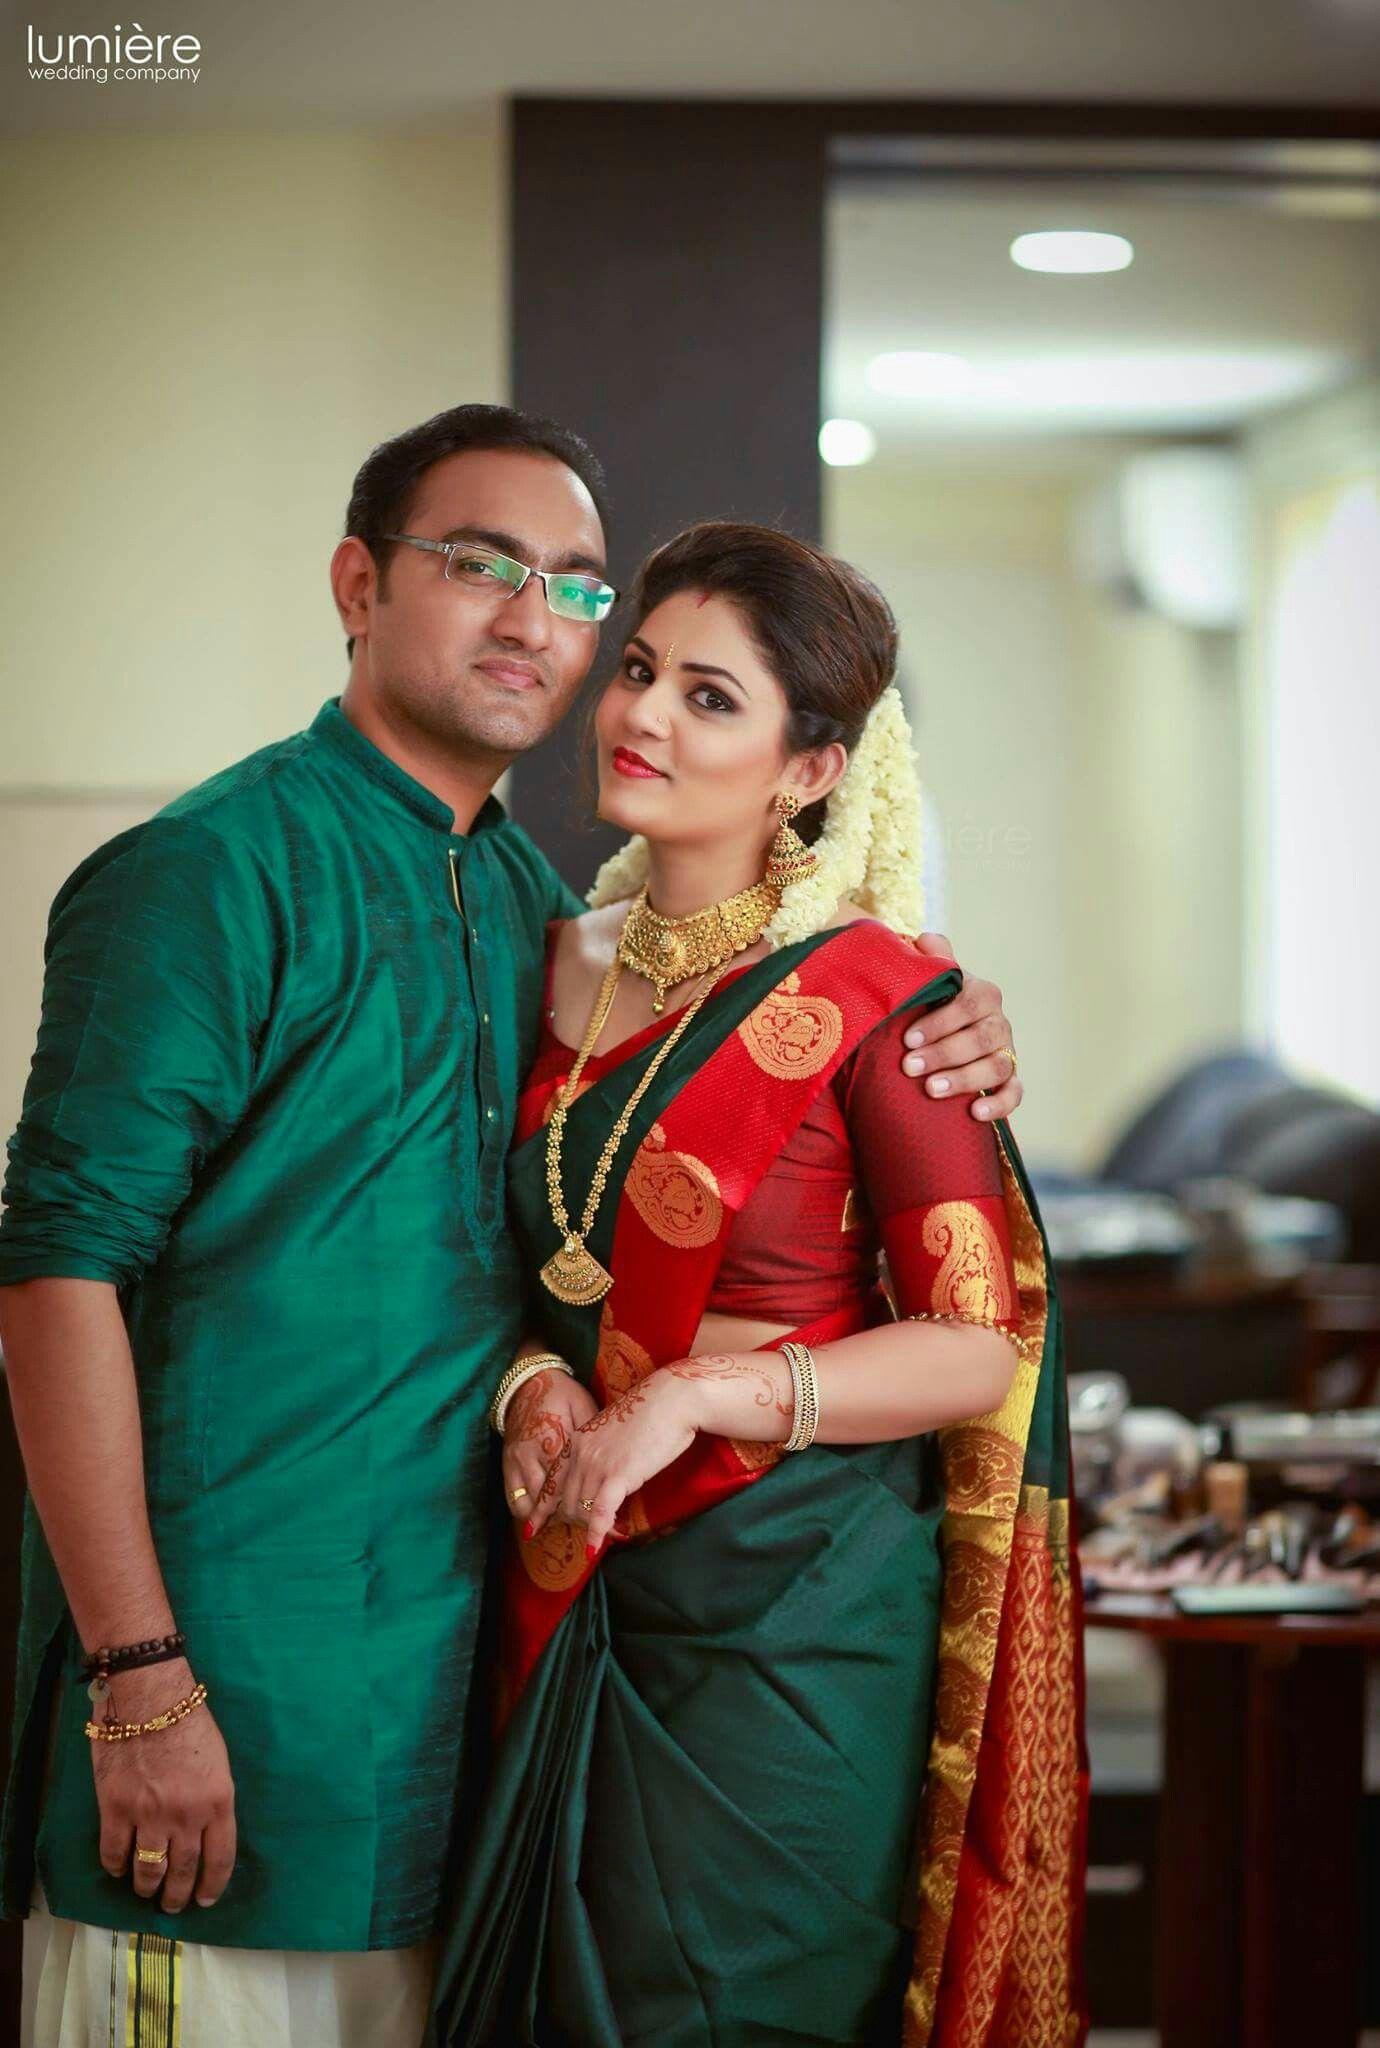 Dress Code For Kerala Wedding